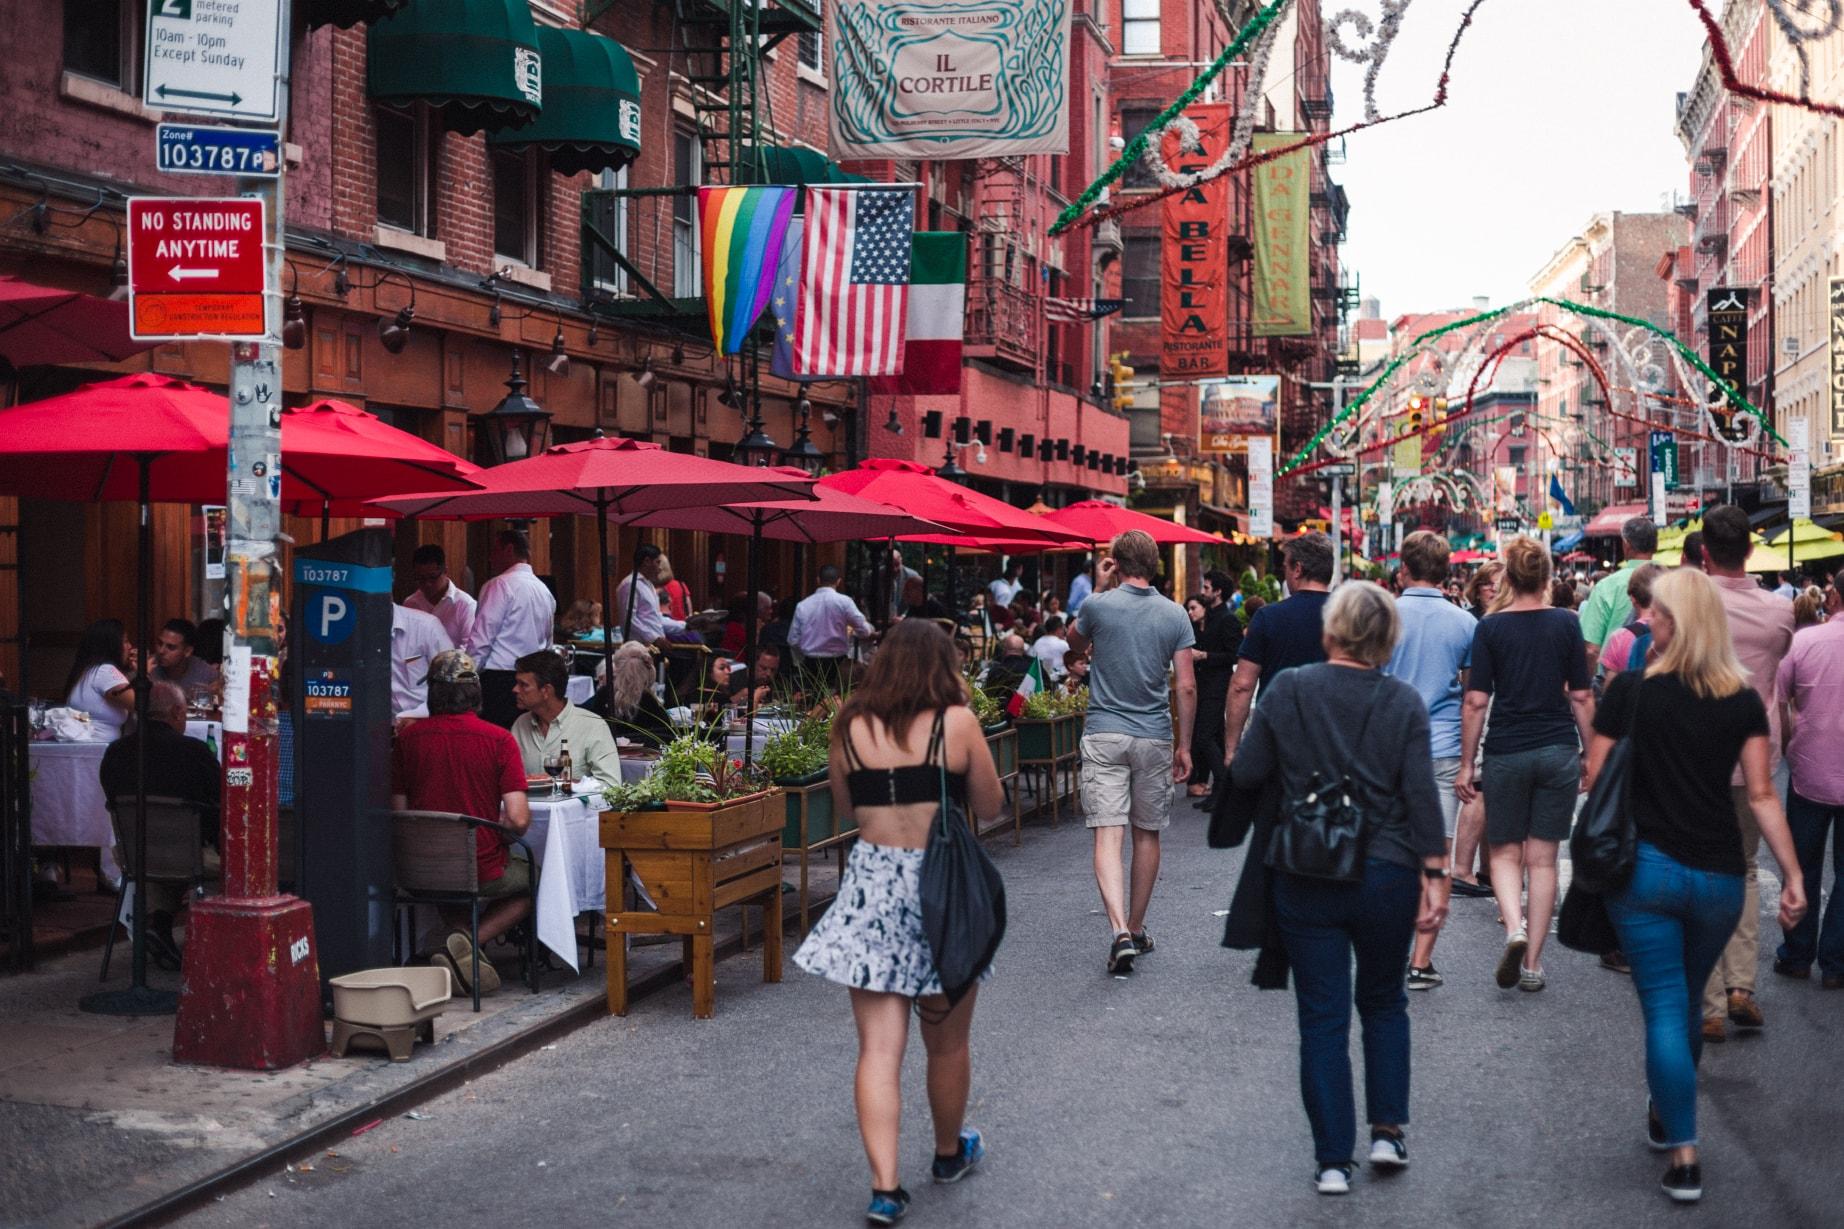 New York City - Little Italy